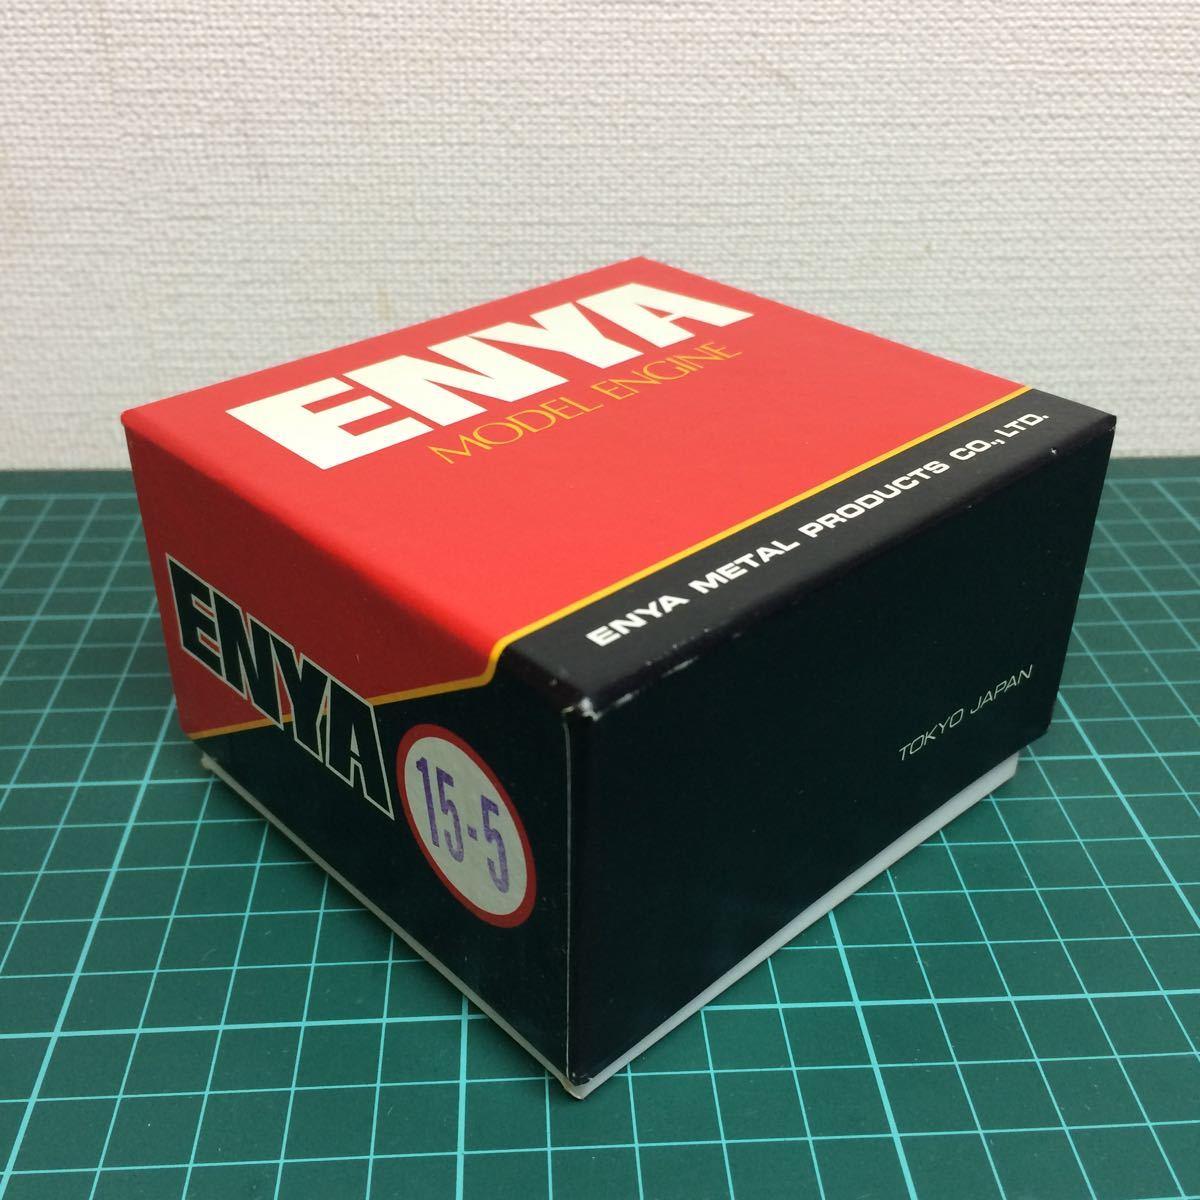 ENYA エンヤ Uコンエンジン 15-V